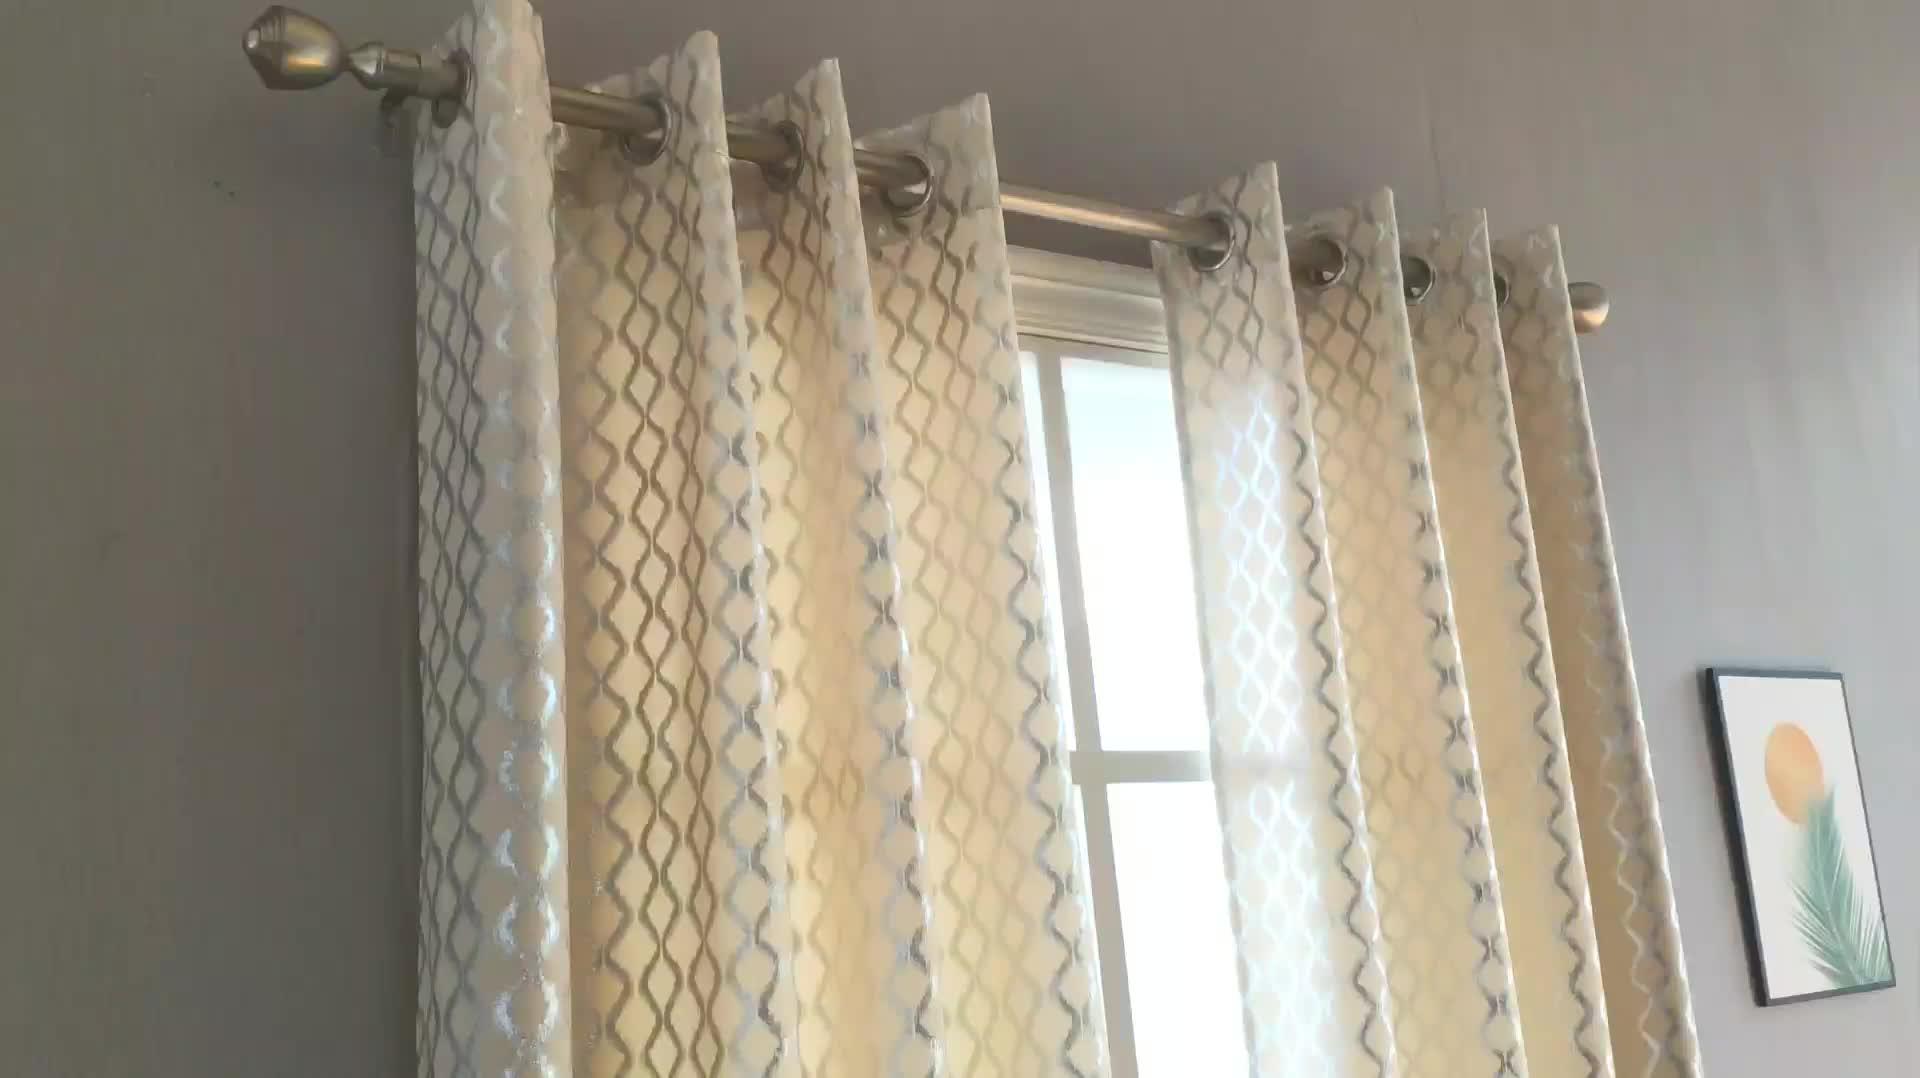 Hot sale velvet curtain  foil printed european curtain luxury window curtains for living rooms